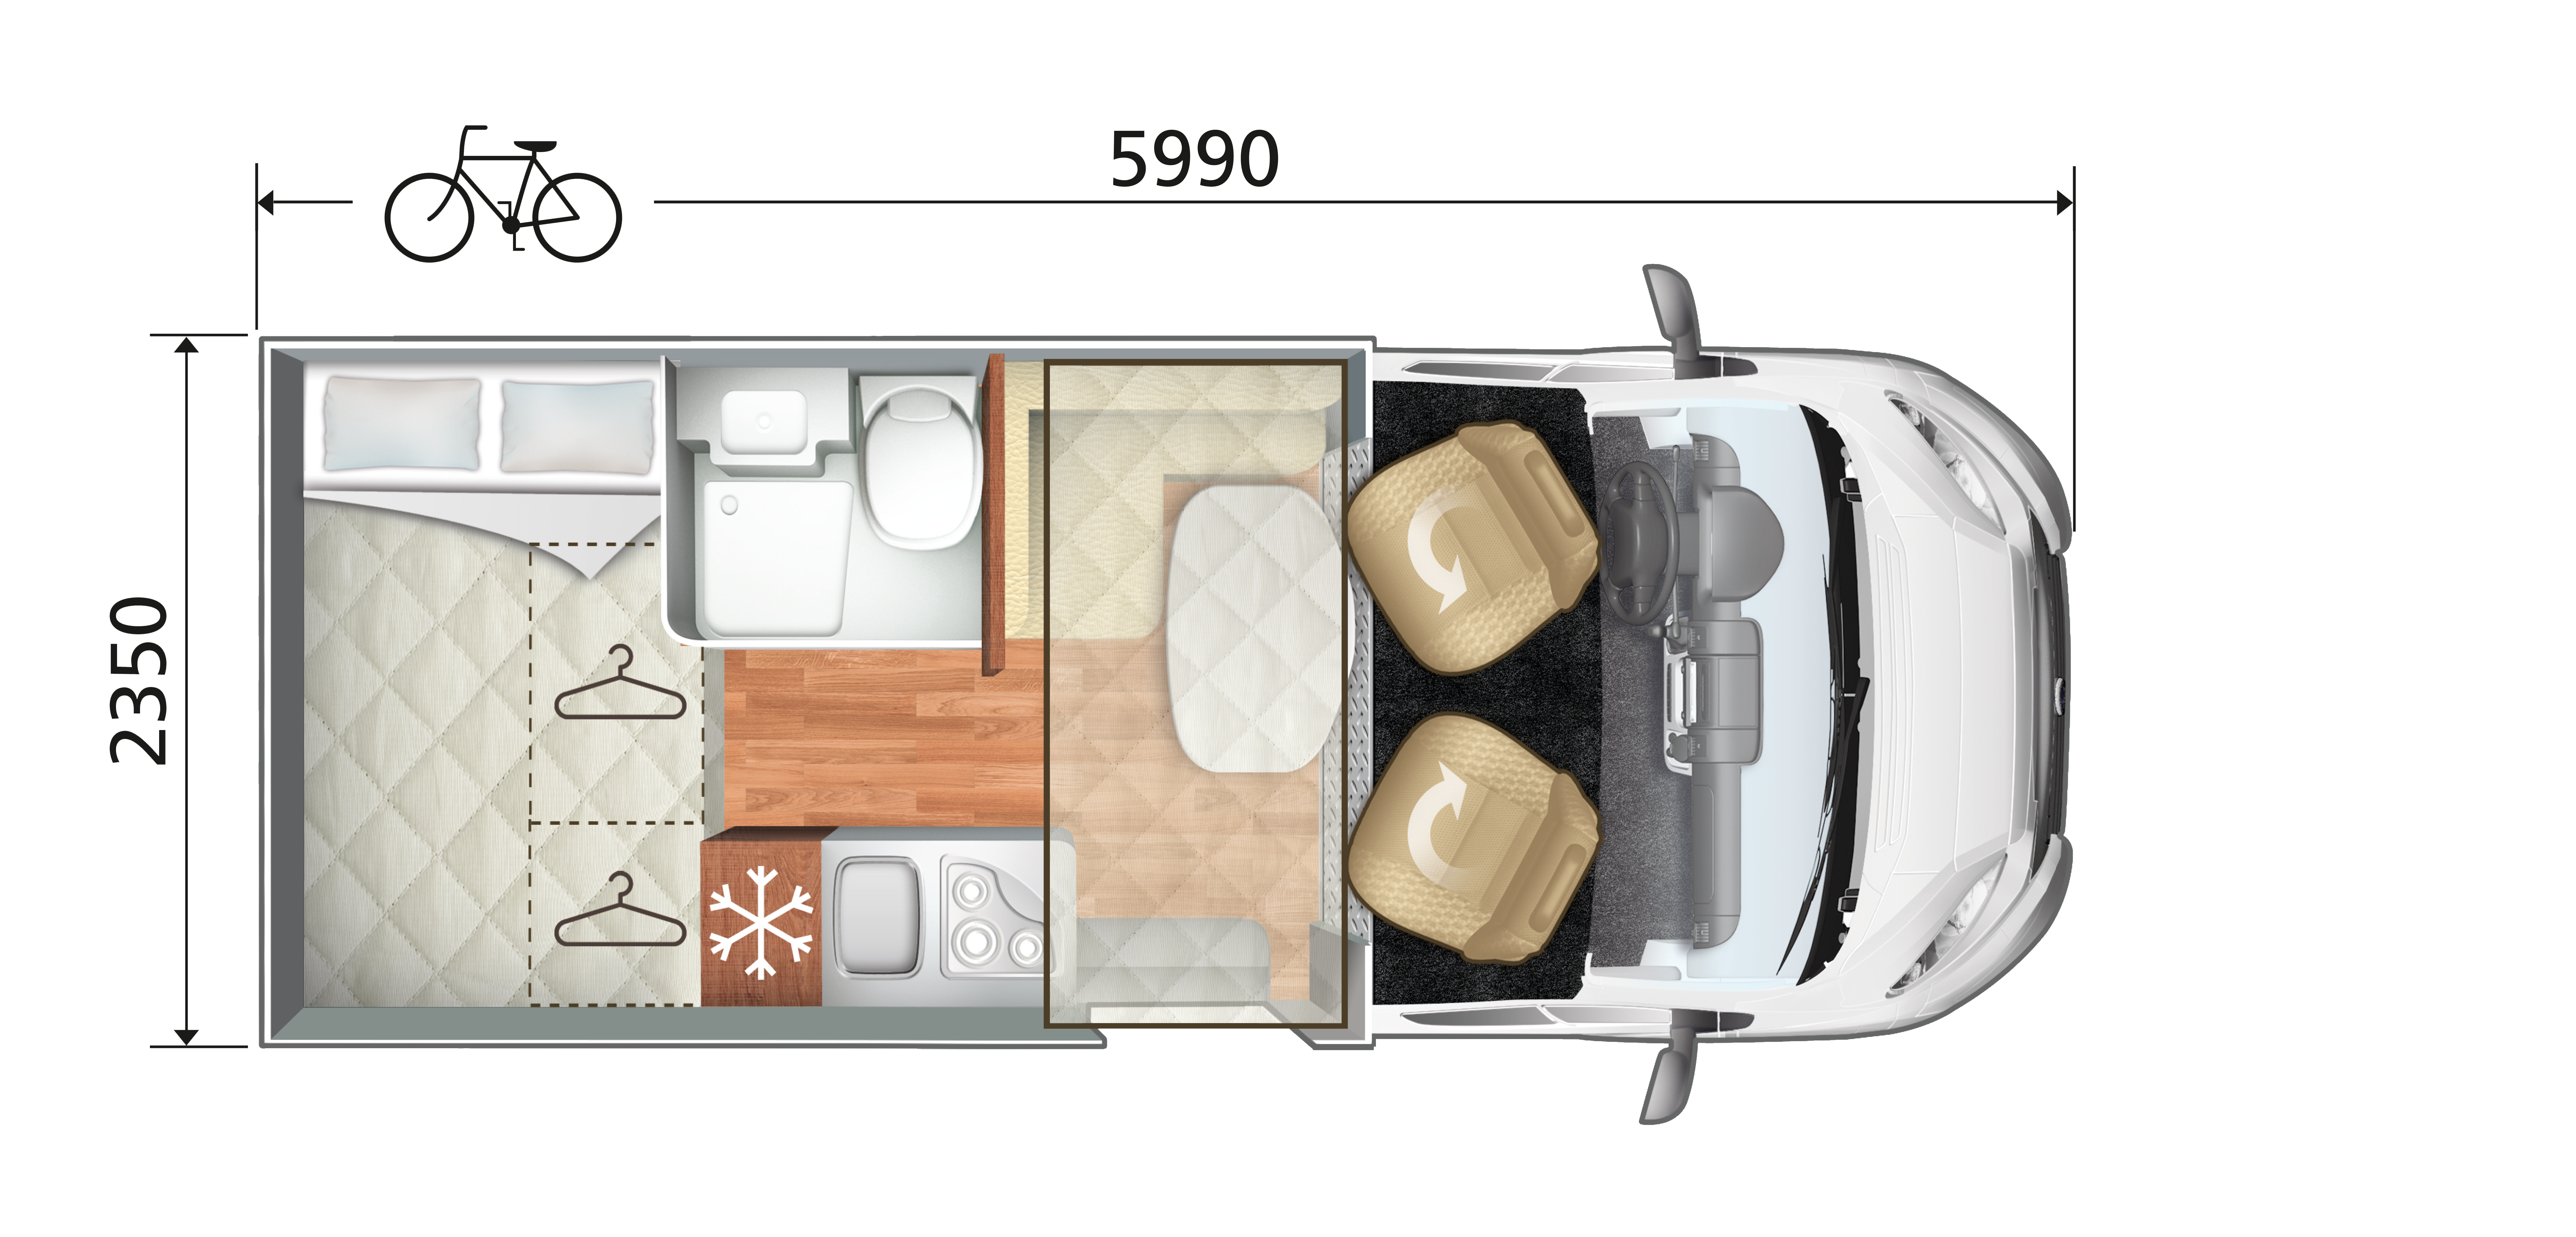 91 XT - Ford